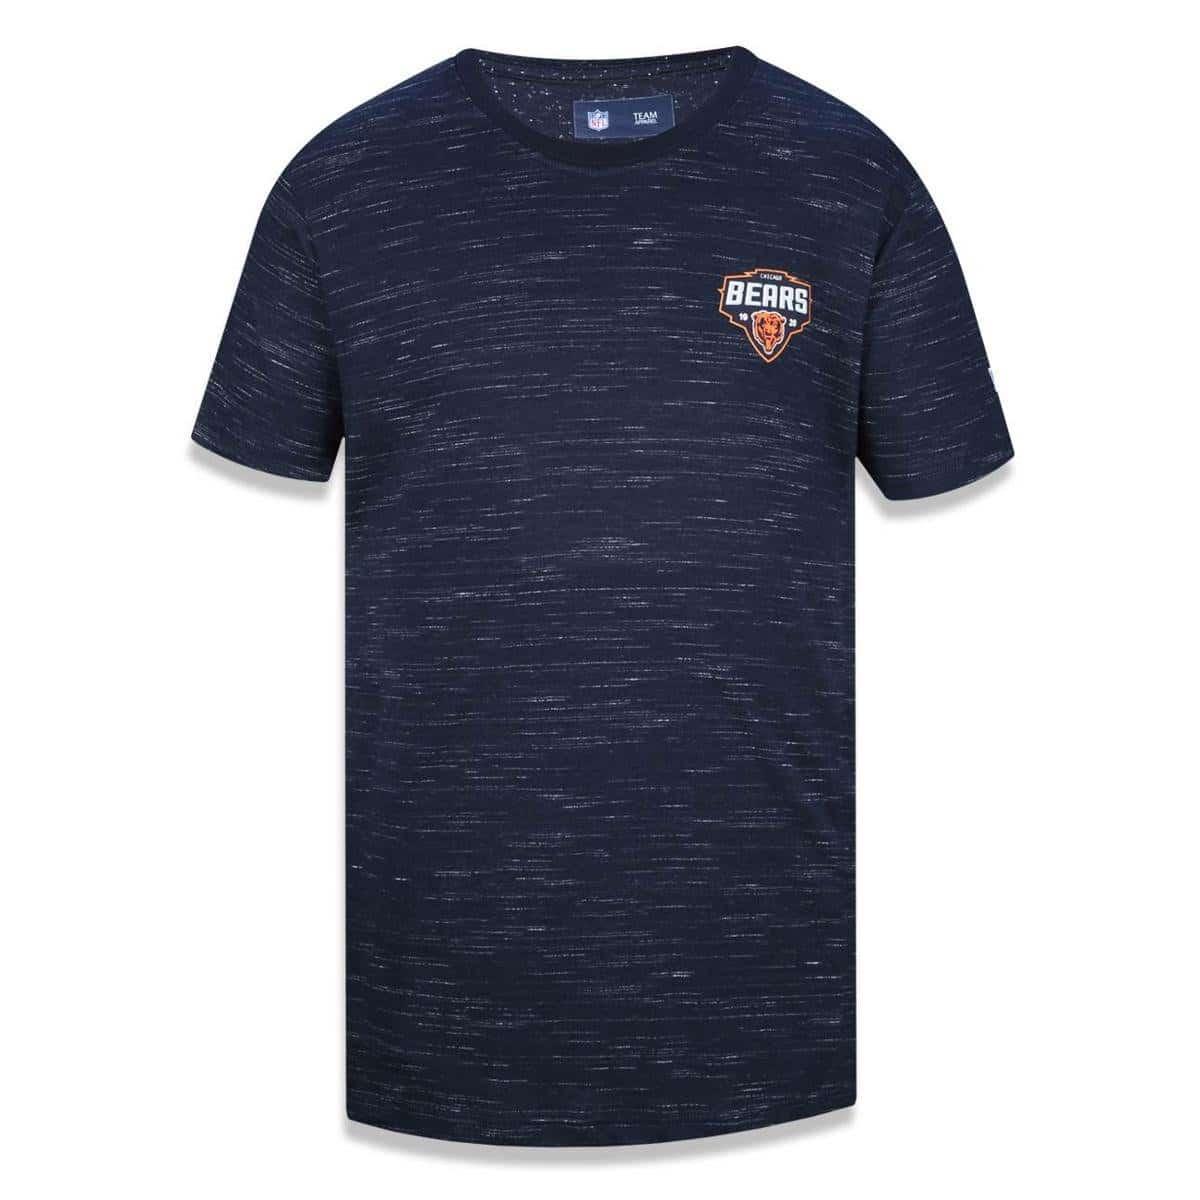 Camiseta do Chicago Bears